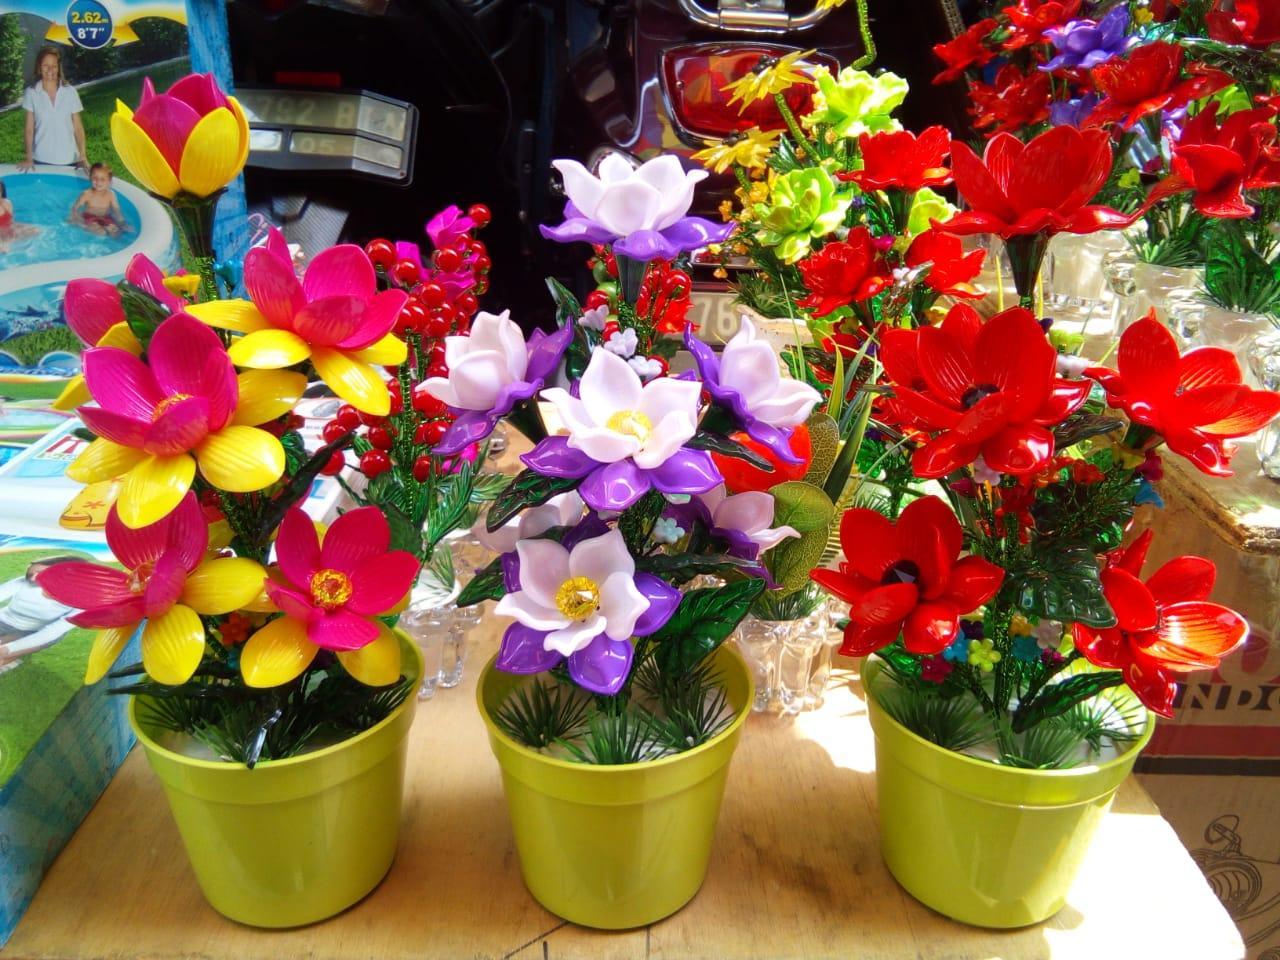 Bunga Hias Akrilik Bunga Mawar Rose Pot Bunga Hiasan Ruang Tamu Kantor Bunga Palsu Bunga Pajangan Bunga Artifisial Aksesoris Dekorasi Rumah Lazada Indonesia